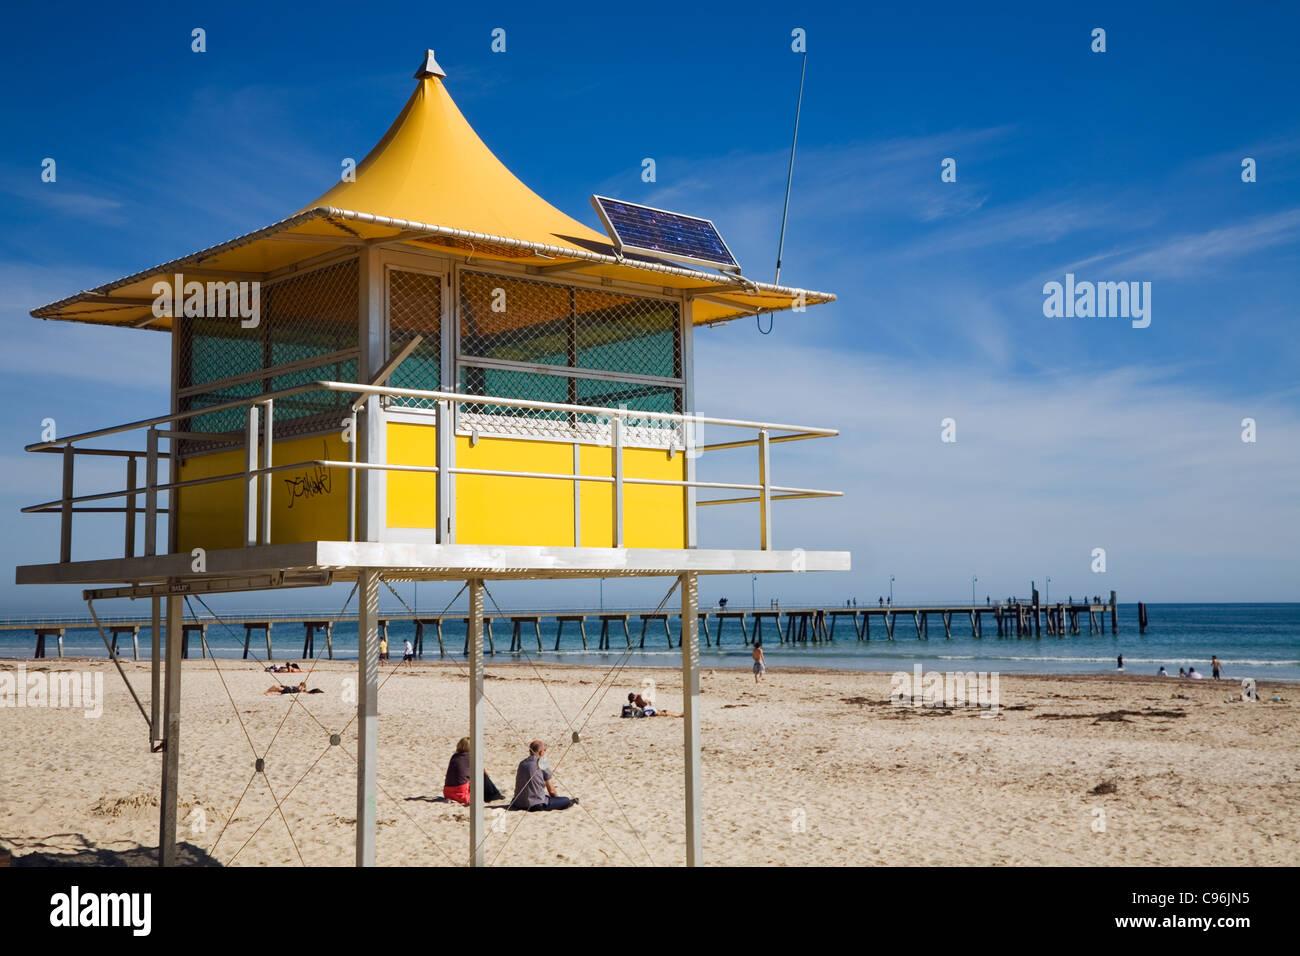 659453b1c0e Lifeguard tower at Glenelg Beach. Adelaide